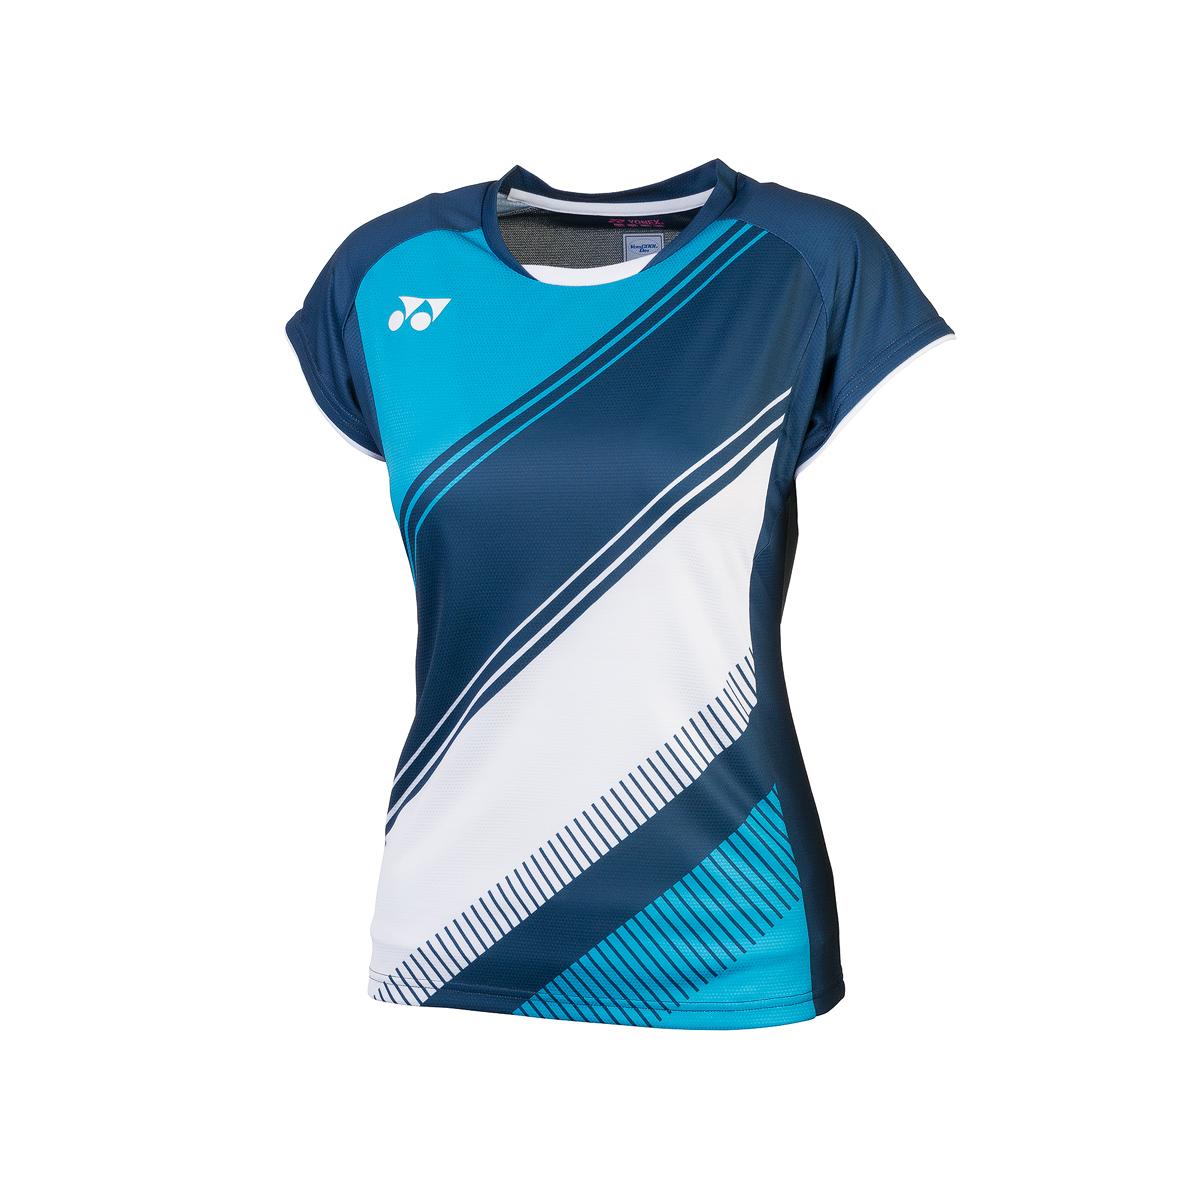 Women's Crew Neck Shirt Badminton TournamentDetailbild - 2